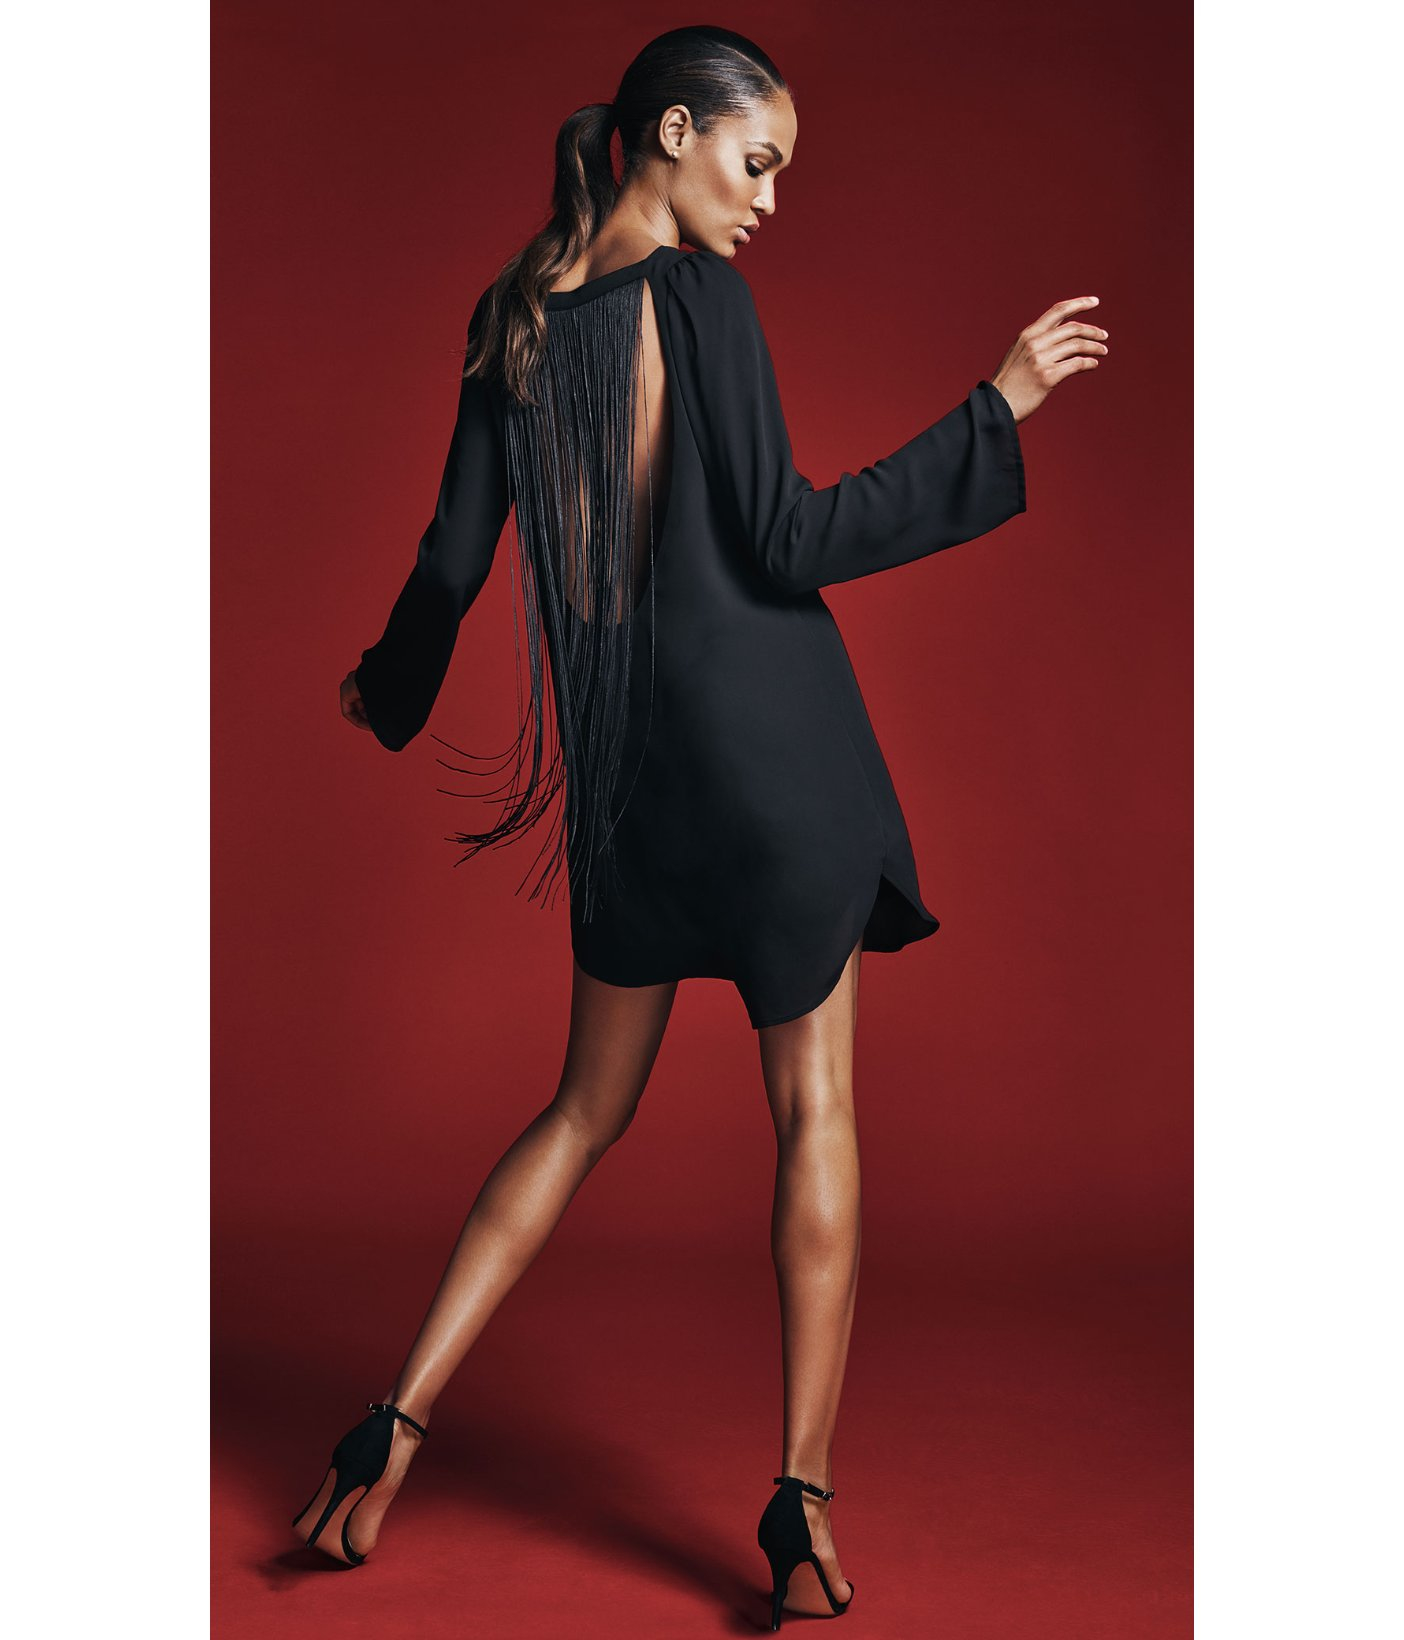 V cut black dress express